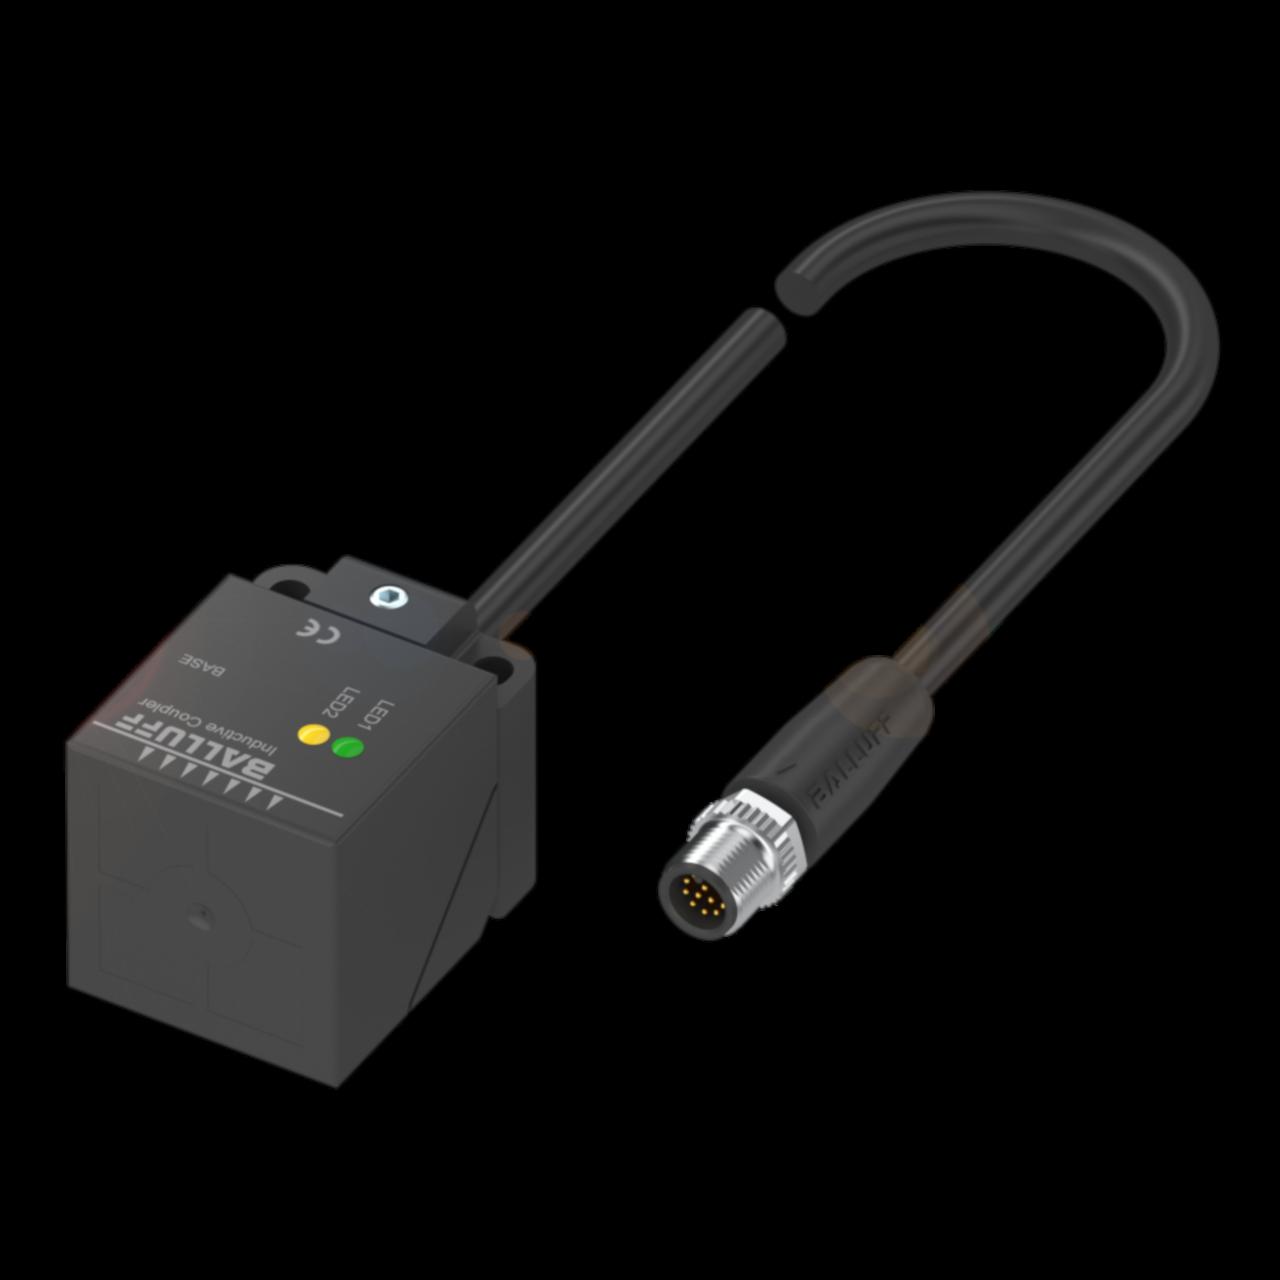 BIC 1I3-P2A50-Q40KFU-EPX0-002-M4CA